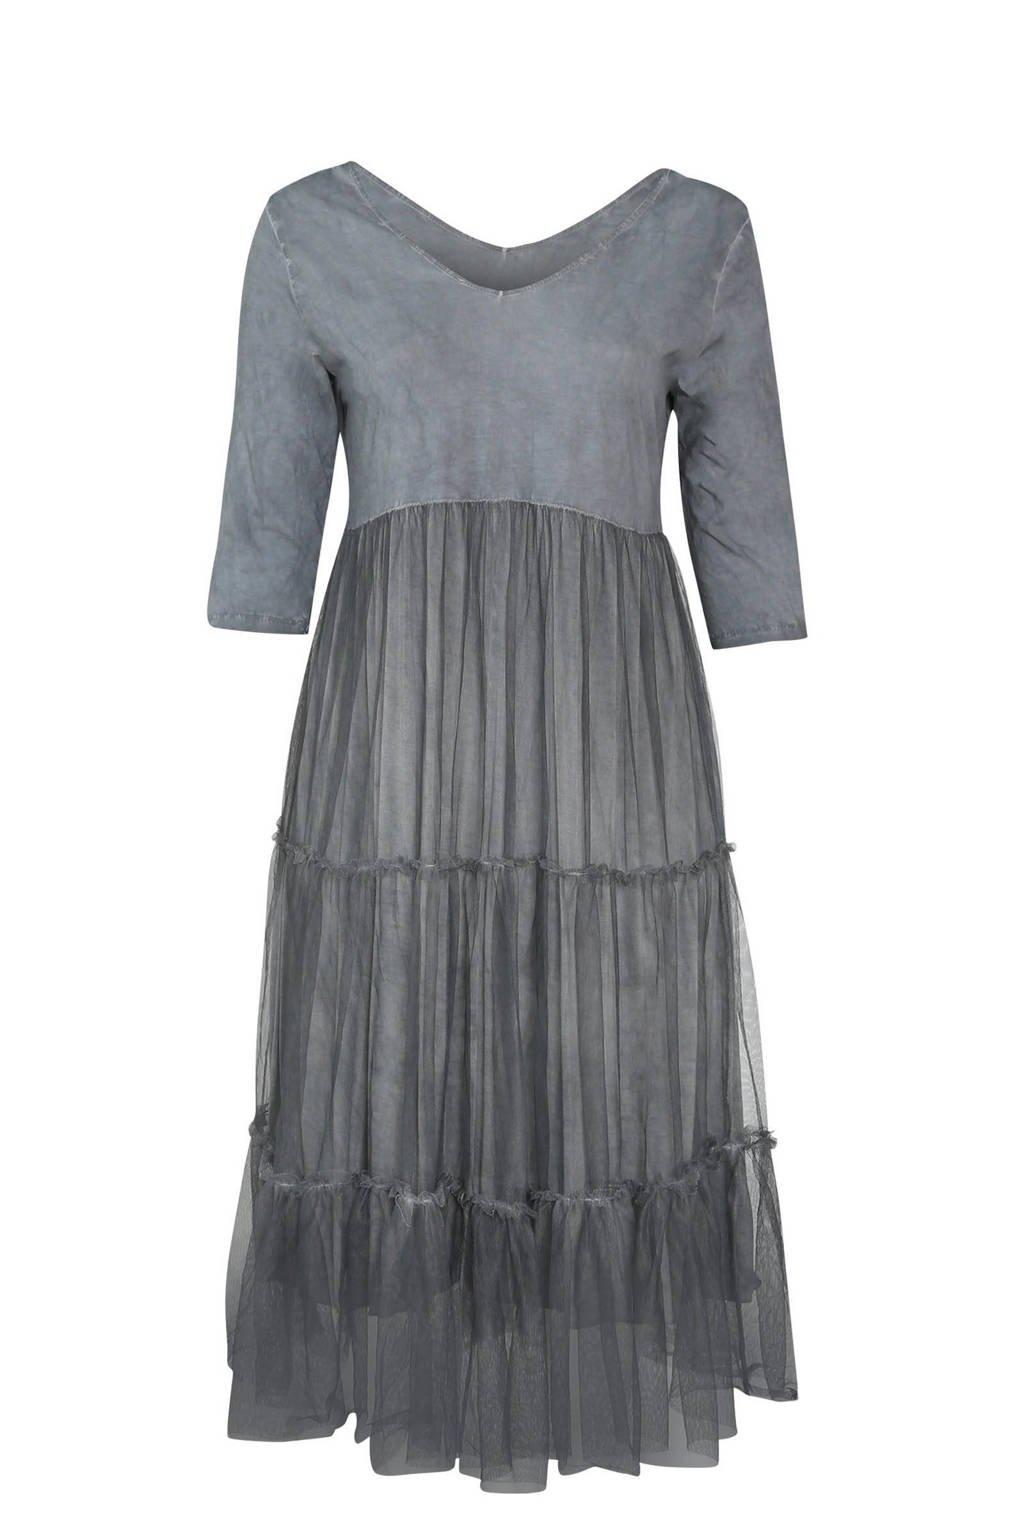 Paprika A-lijn jurk anthracite, Anthracite